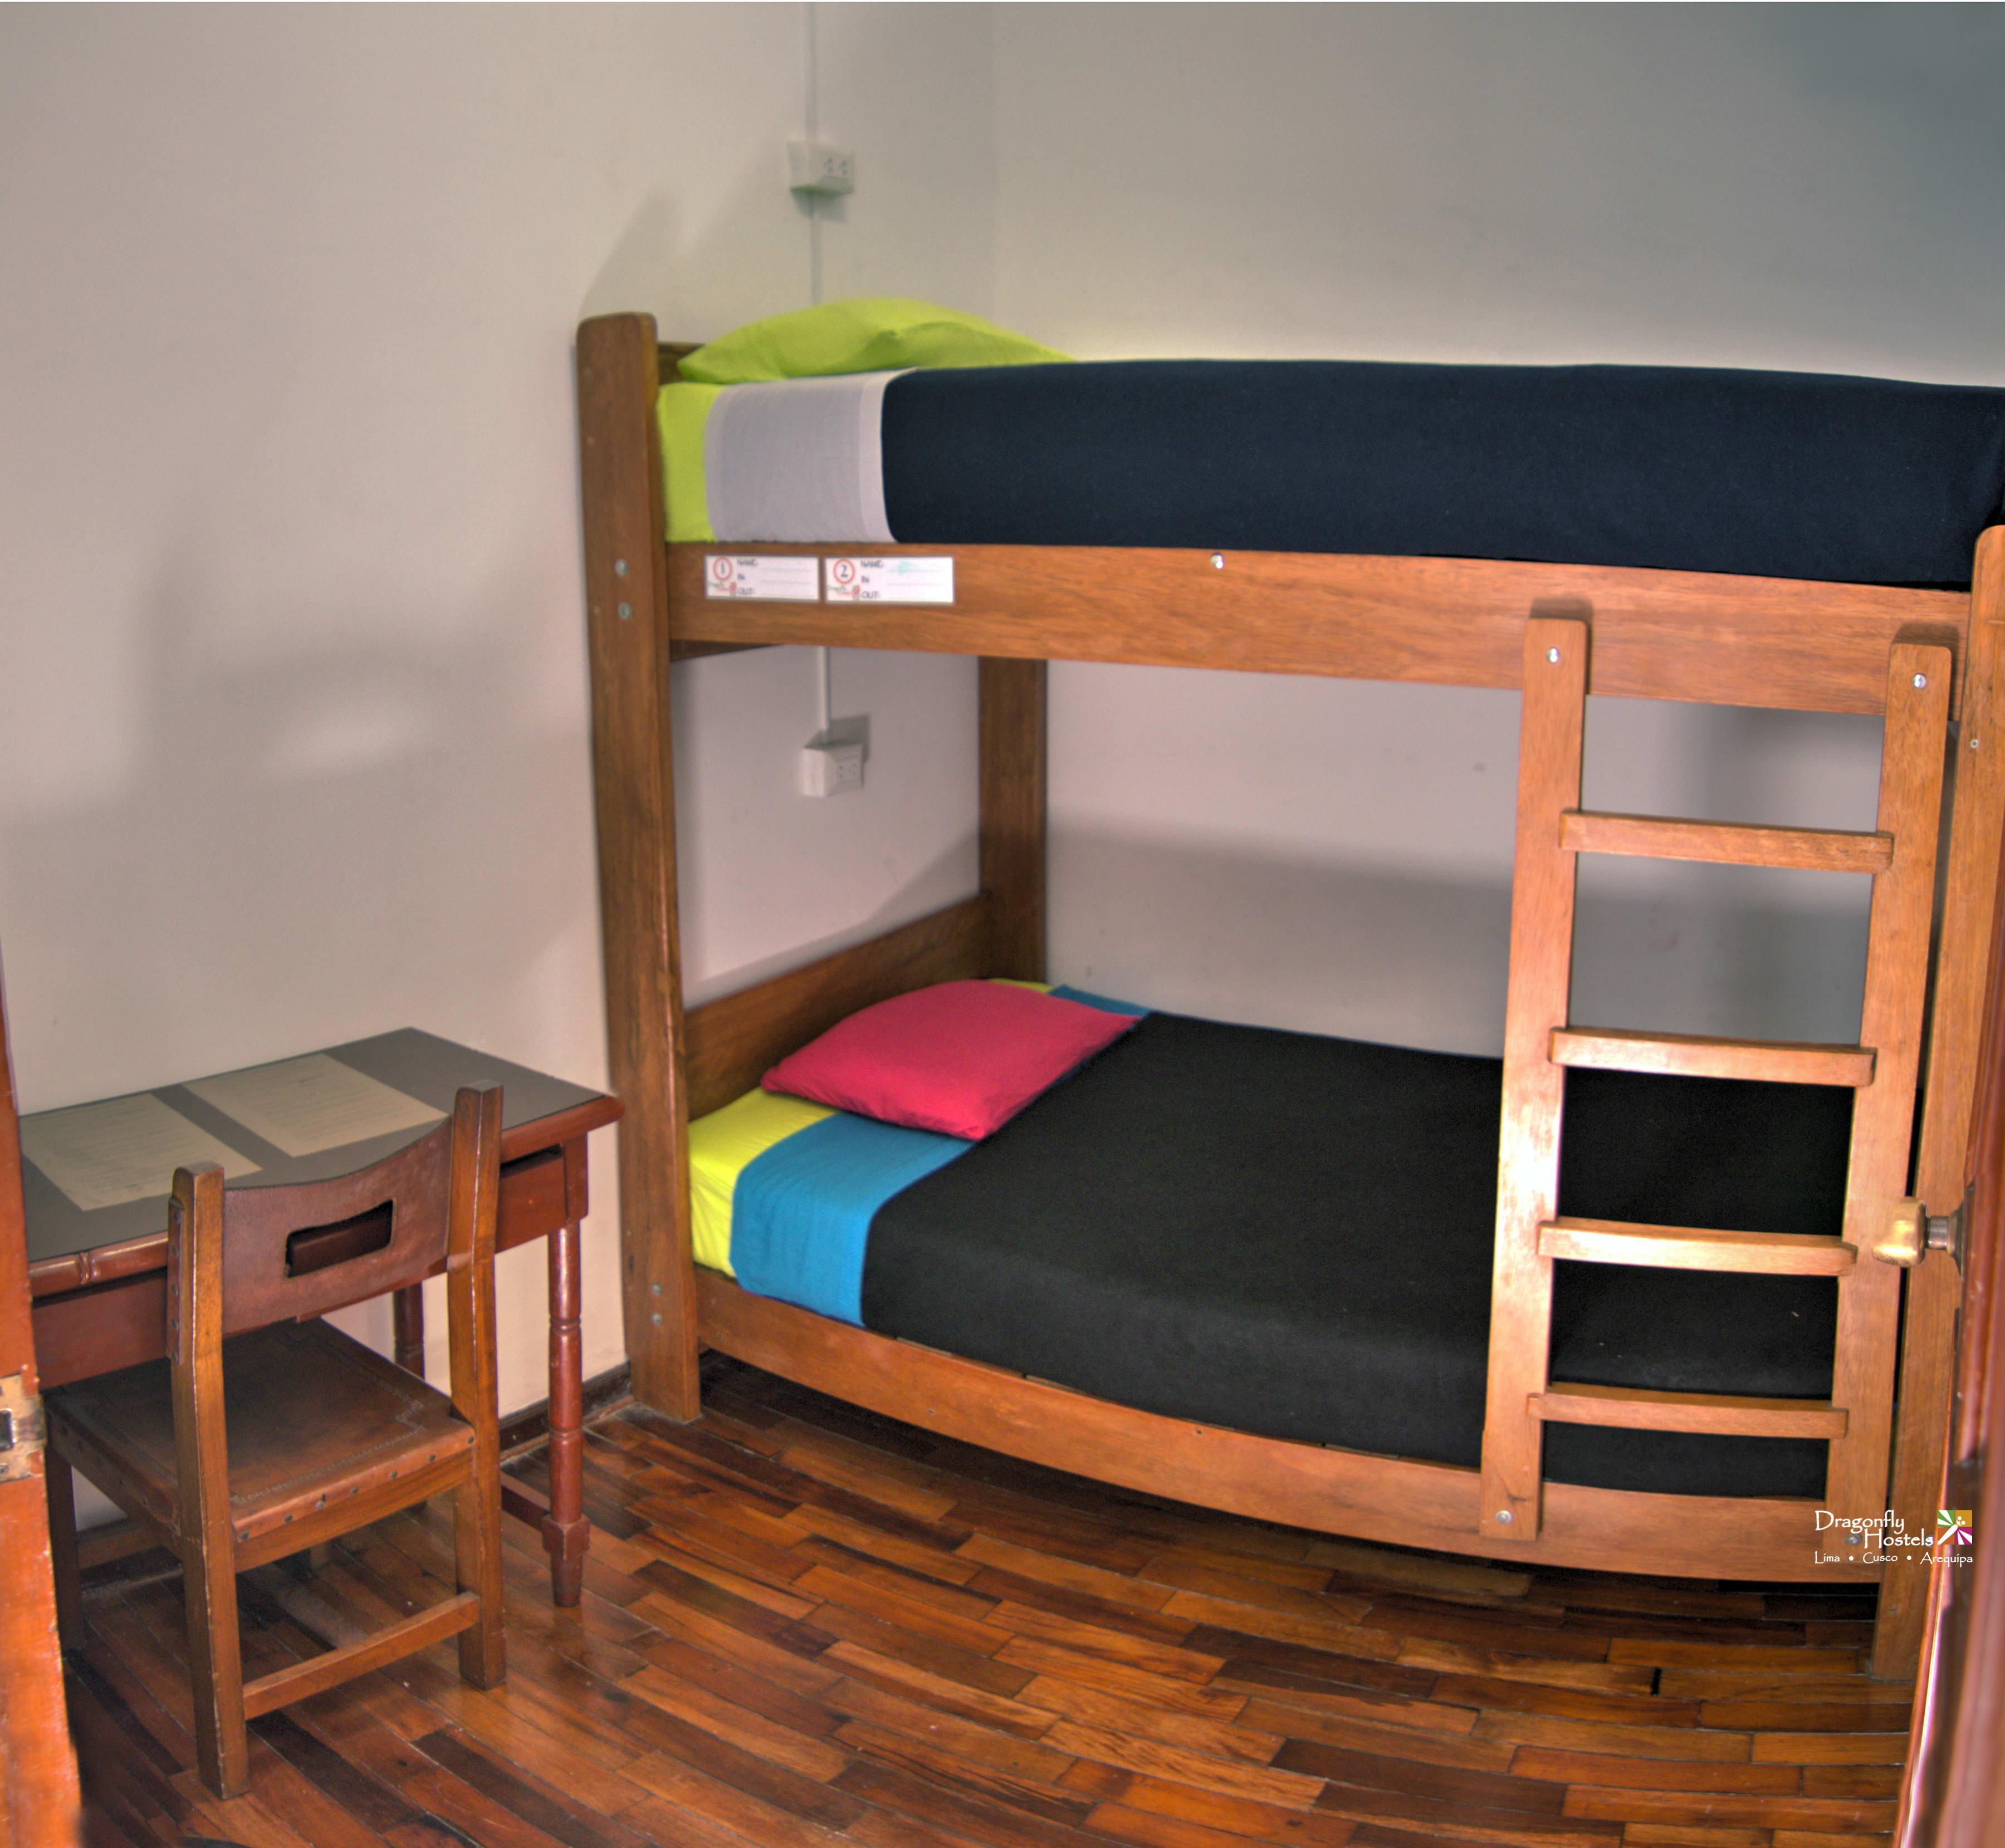 HOSTEL - Dragonfly Hostels Miraflores